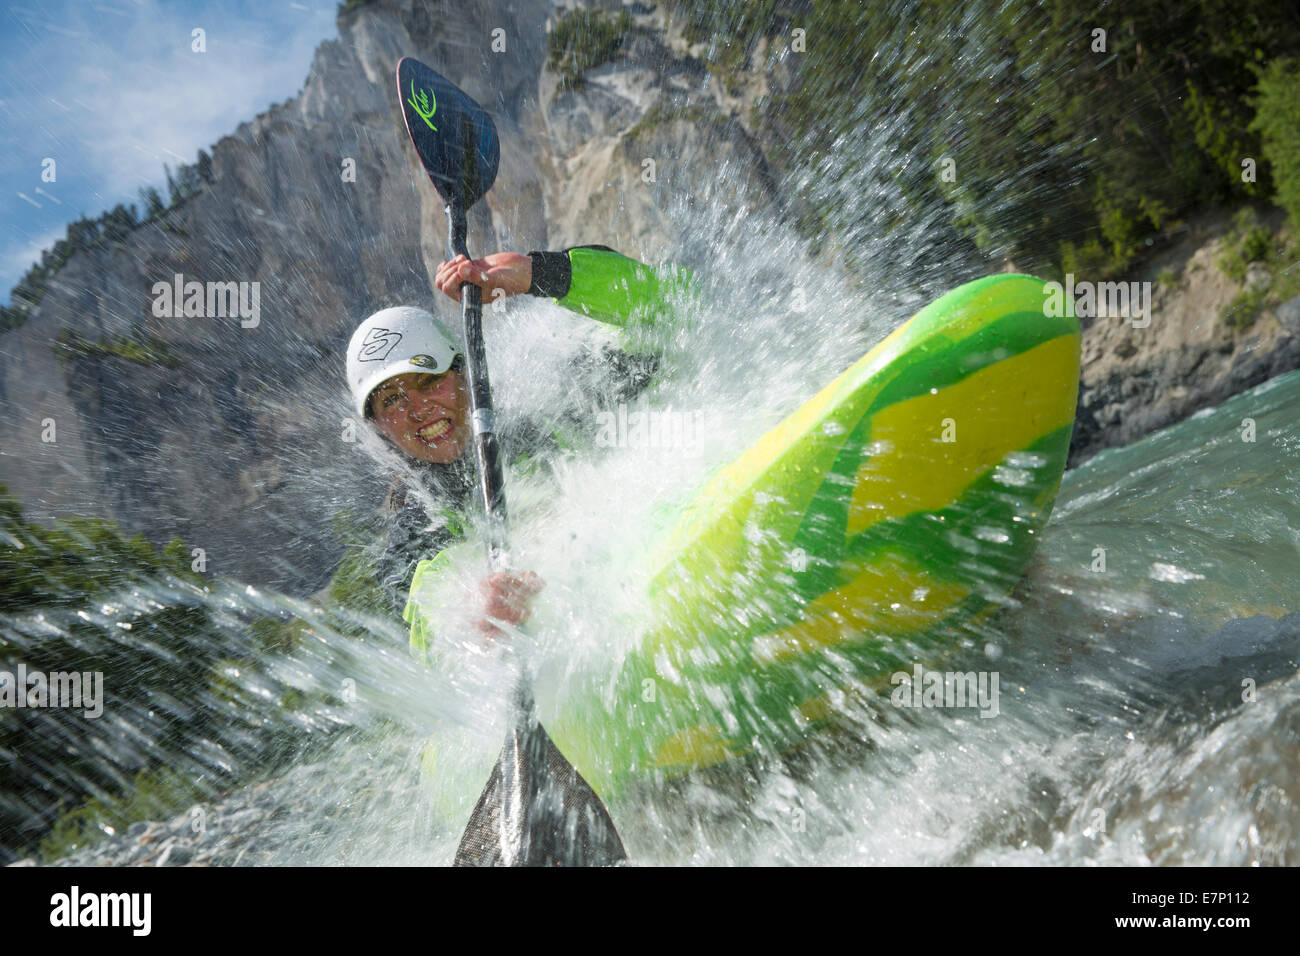 Rhine gulch, water sport, Versam, GR, river, flow, body of water, water, gulch, canton, GR, Graubünden, Grisons, - Stock Image